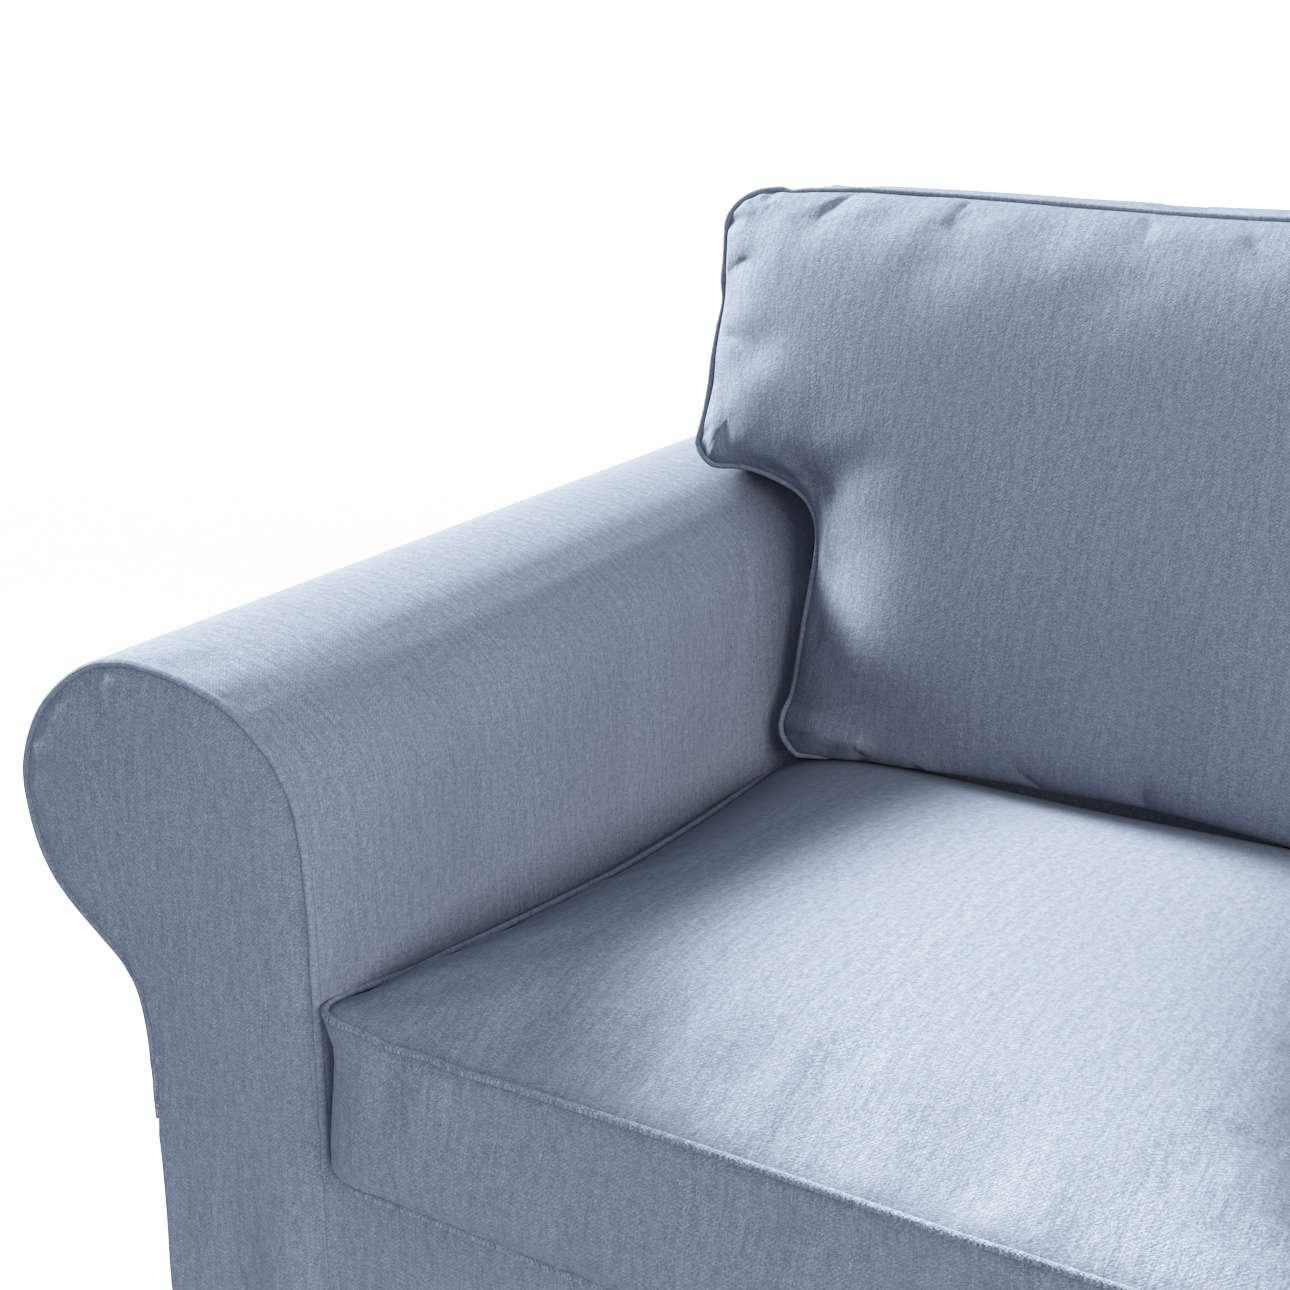 Ektorp 3-Sitzer Schlafsofabezug, ALTES Modell Sofahusse Ektorp 3-Sitzer Schlafsofa von der Kollektion Chenille , Stoff: 702-13